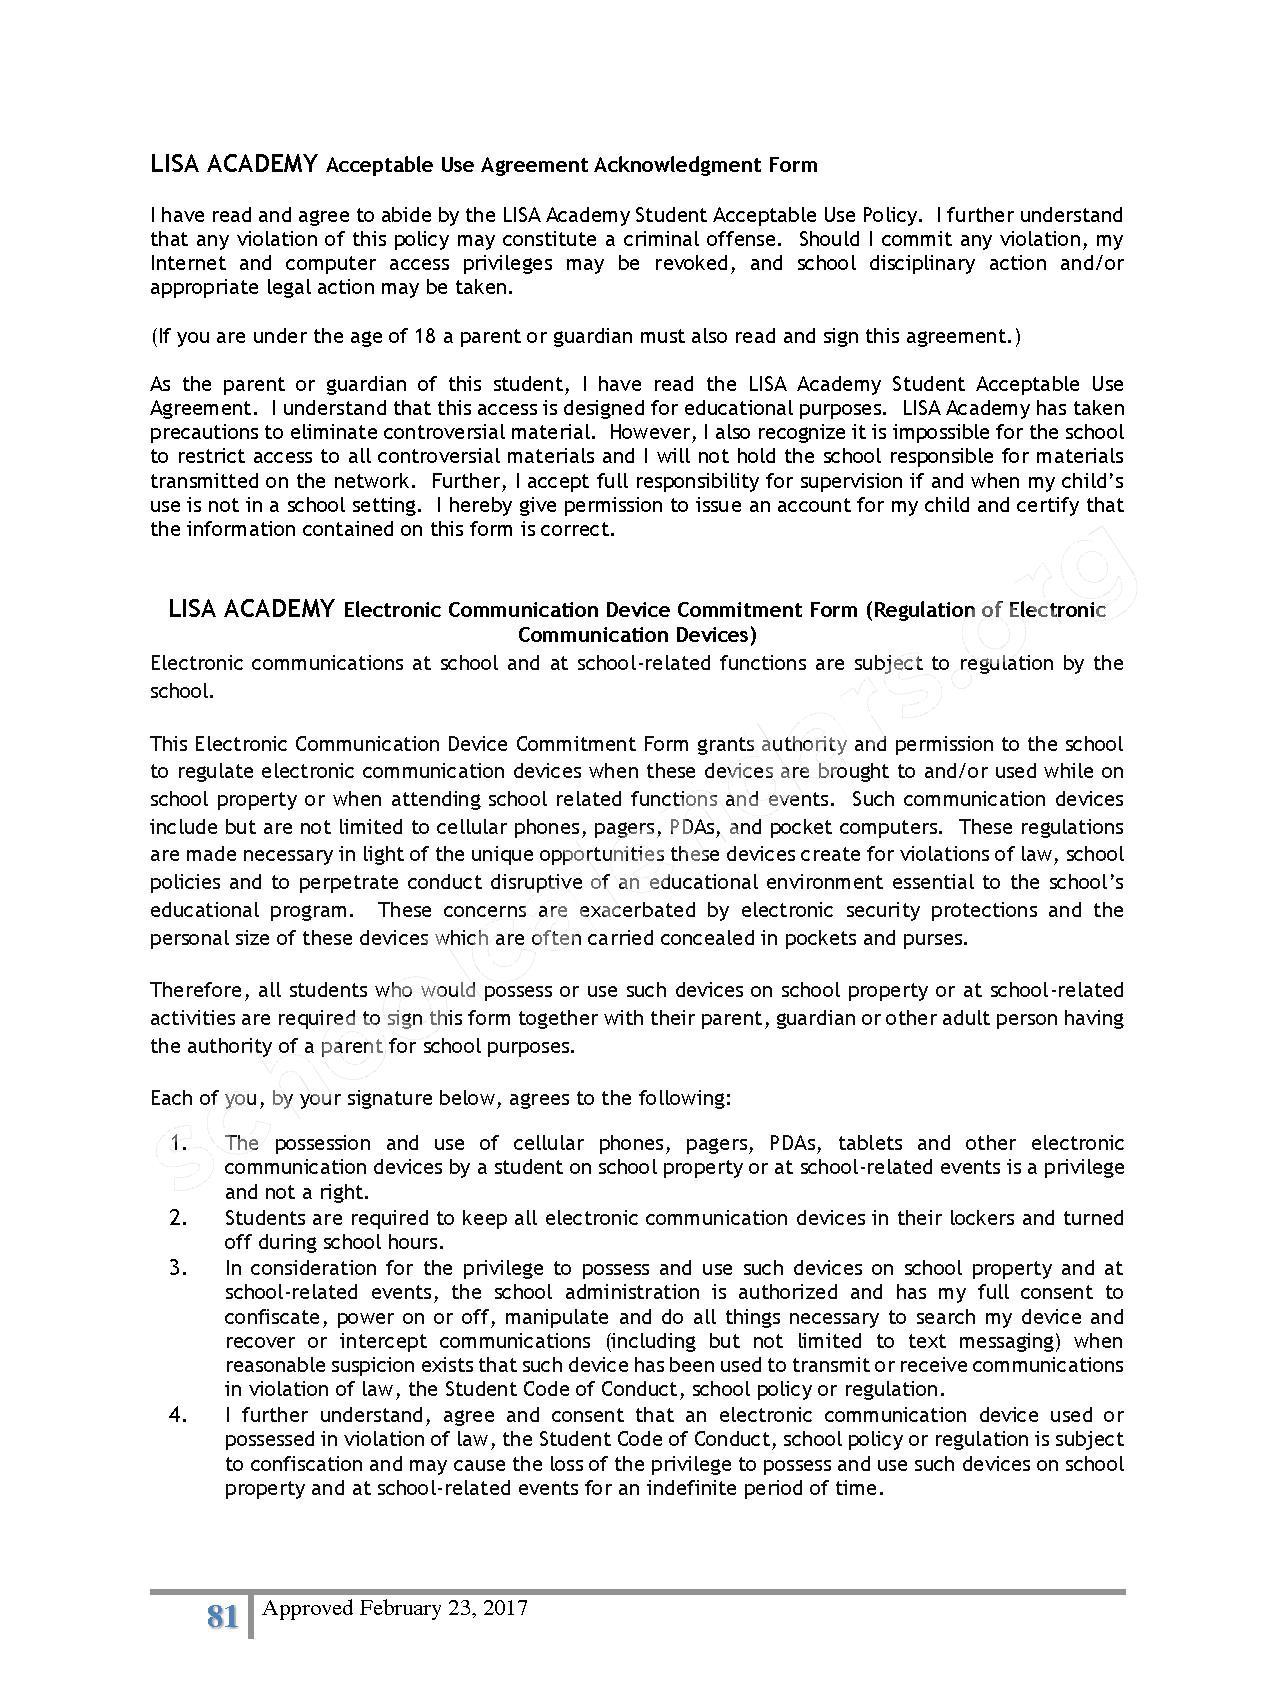 2016 - 2017 District Calendar – Lisa Academy Public Charter Schools – page 81